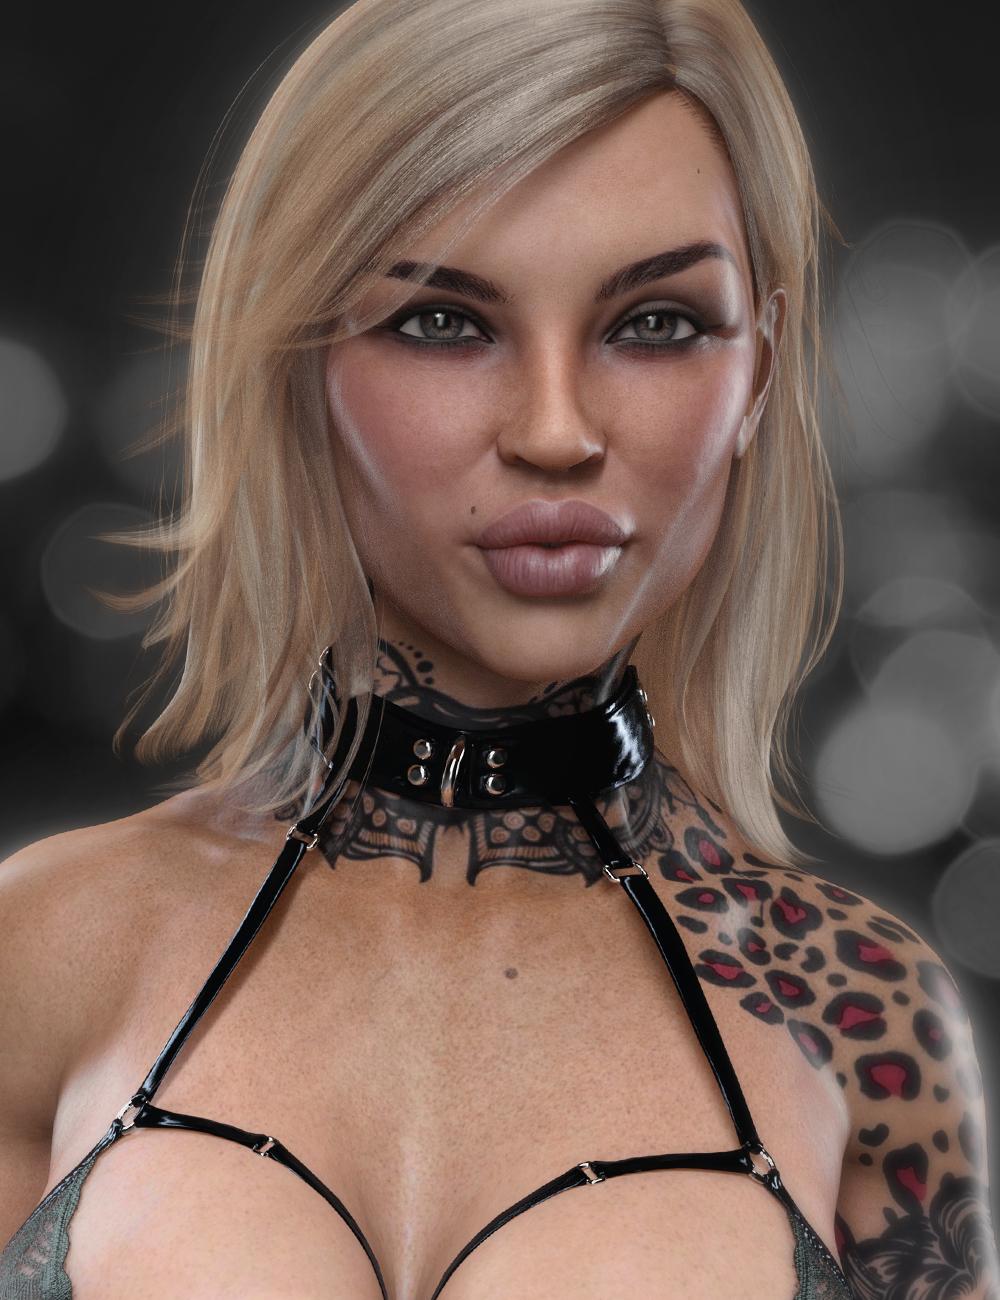 HH Sayble for Genesis 8.1 Female by: Herschel Hoffmeyer, 3D Models by Daz 3D